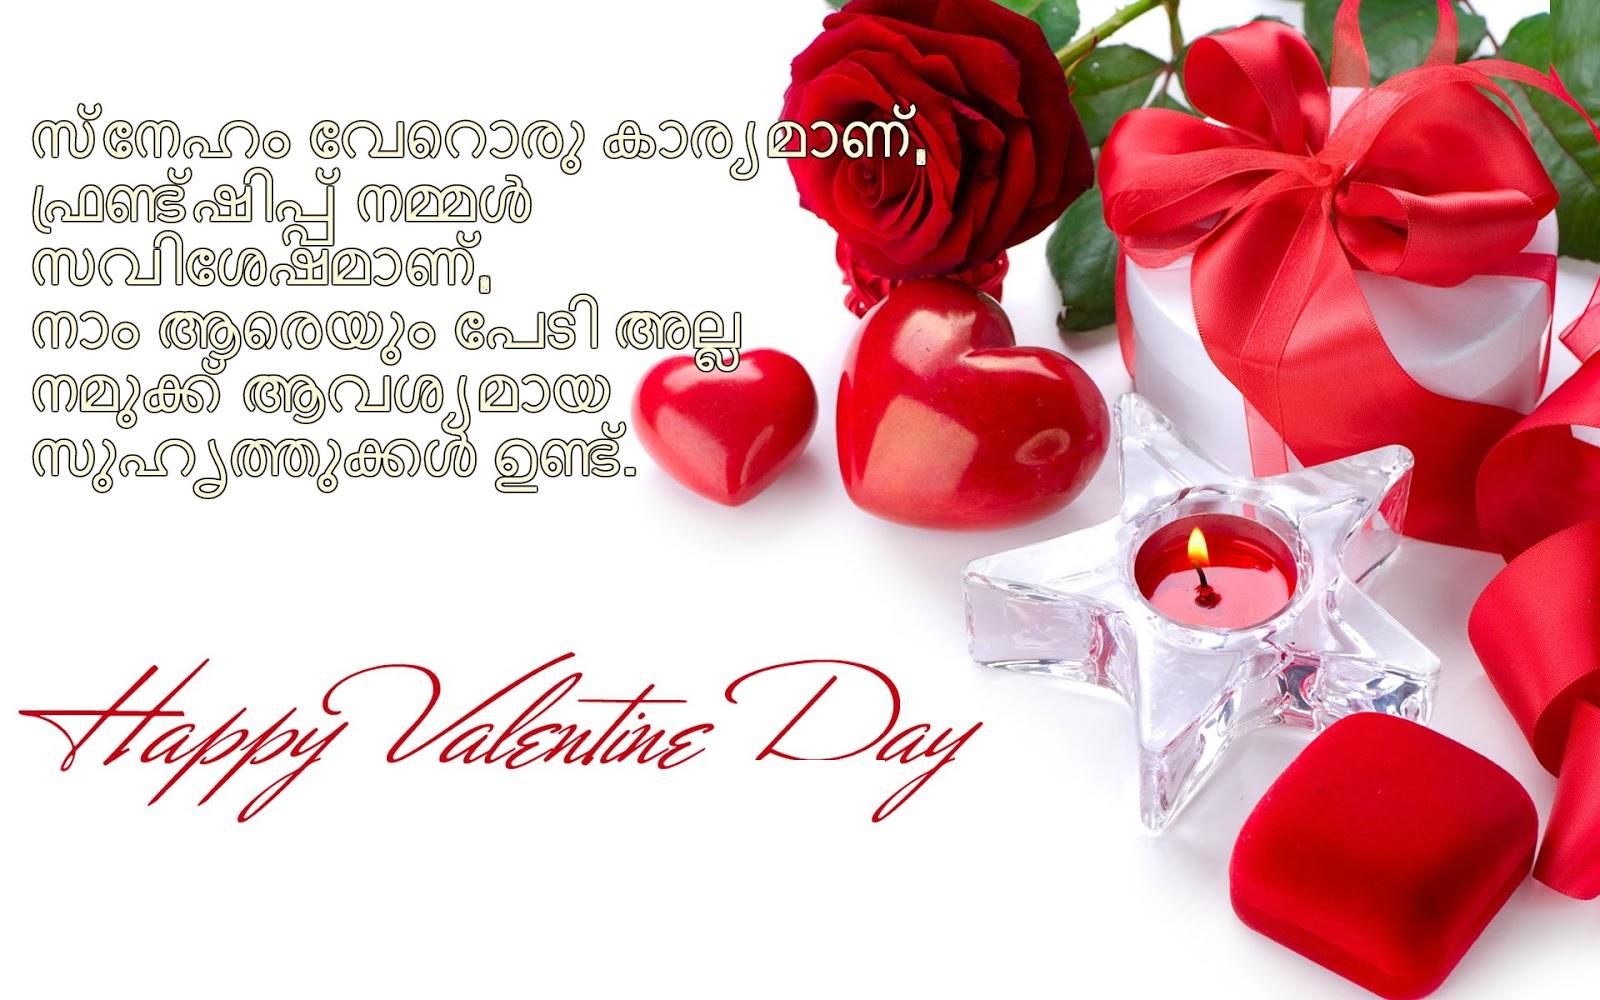 Must see Wallpaper Love Malayalam - valentine%2Bday%2Bimages%2Bshayari%2Bsms%2BMalayalam%2B%25281%2529  Picture_486535.jpg